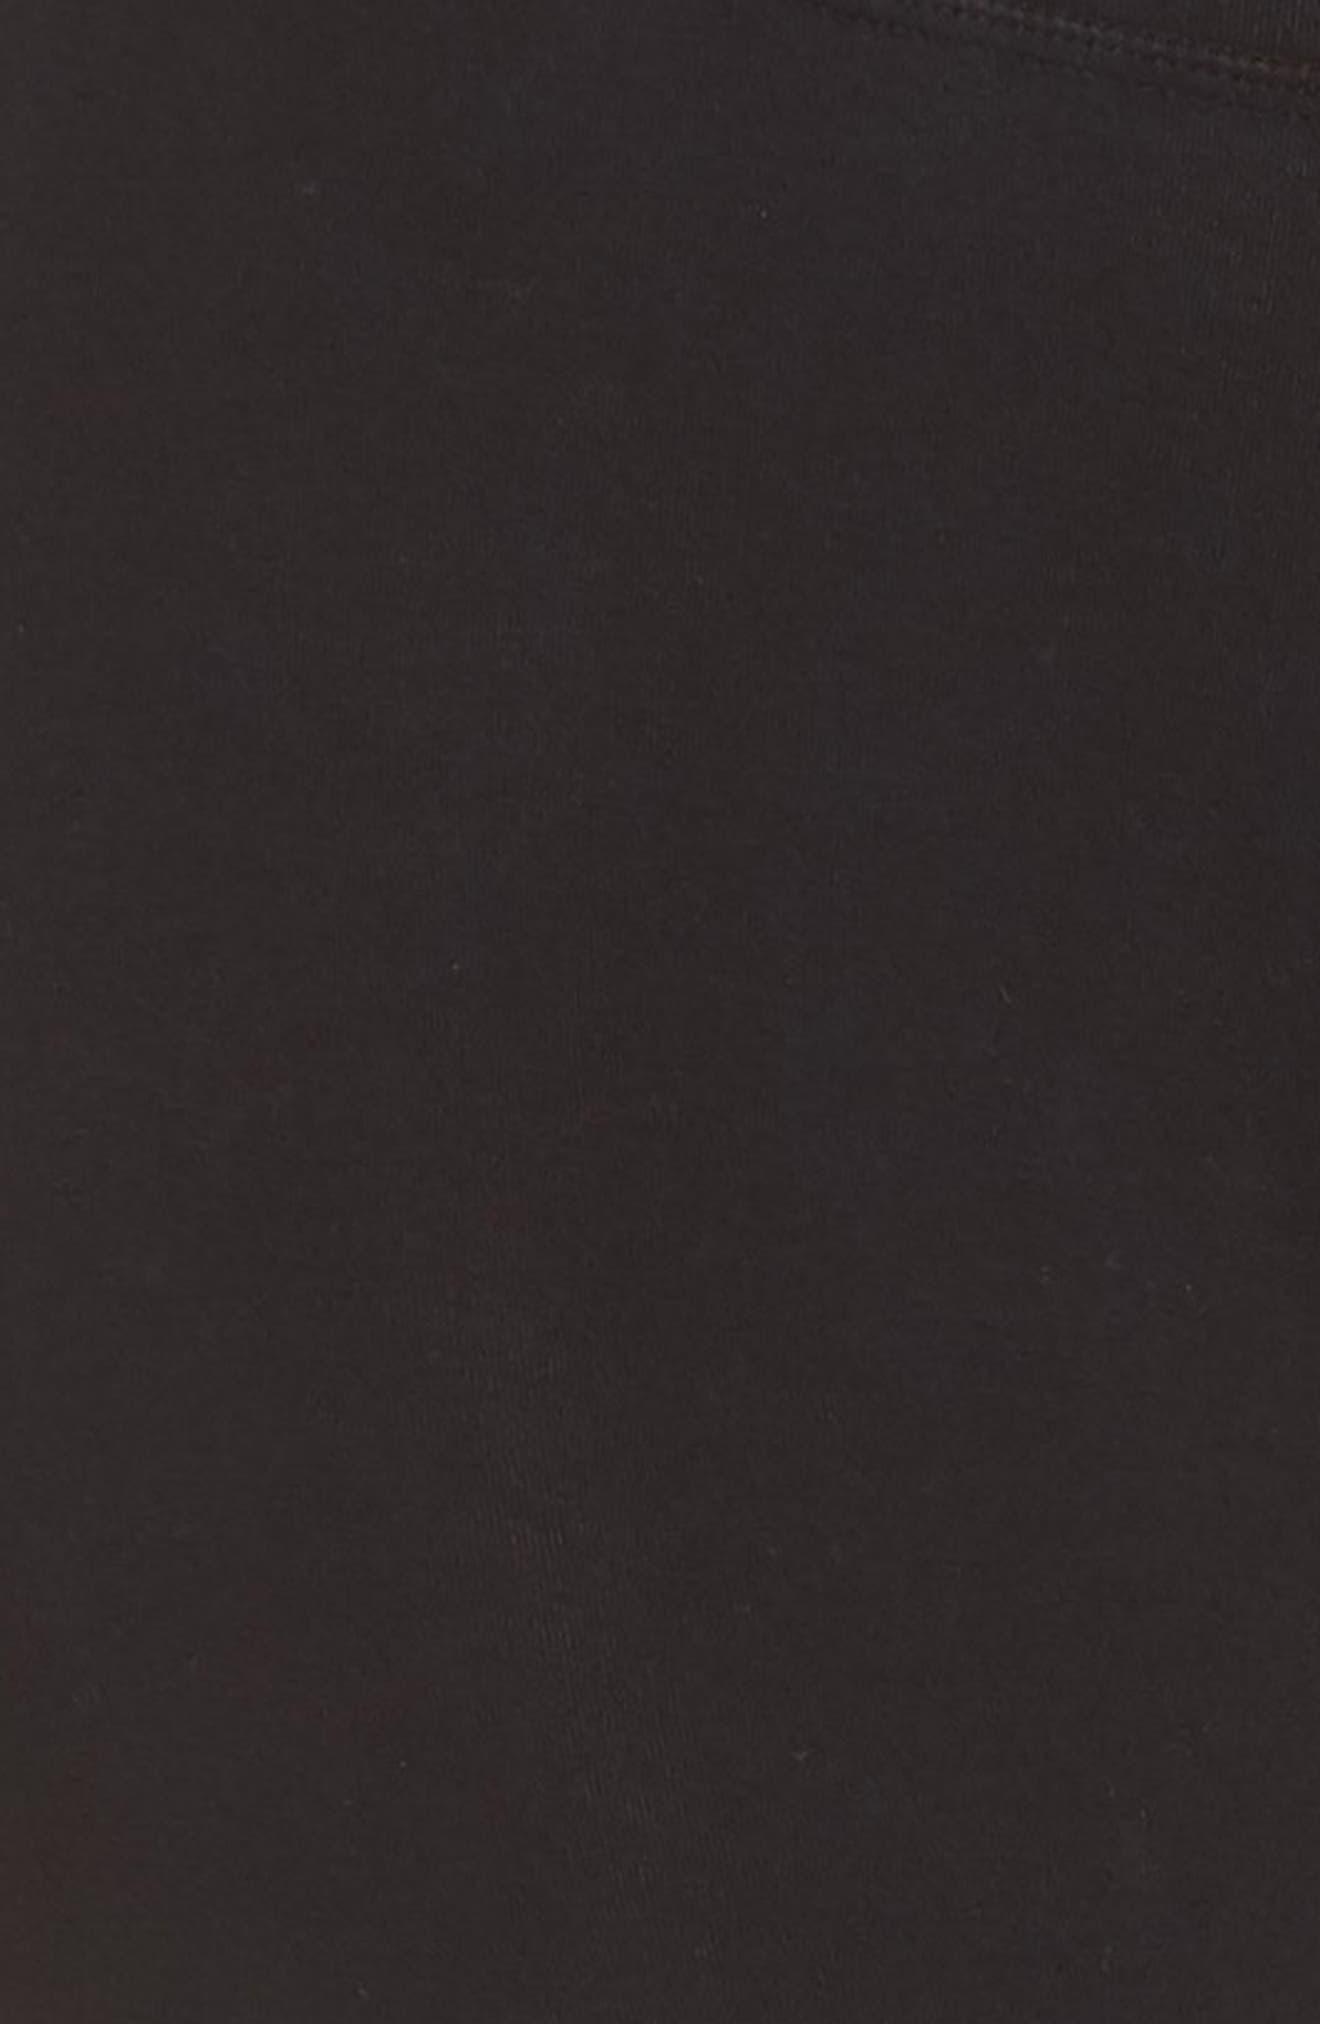 Sunrise Tie Dye Capri Leggings,                             Alternate thumbnail 6, color,                             STELLAR ONYX